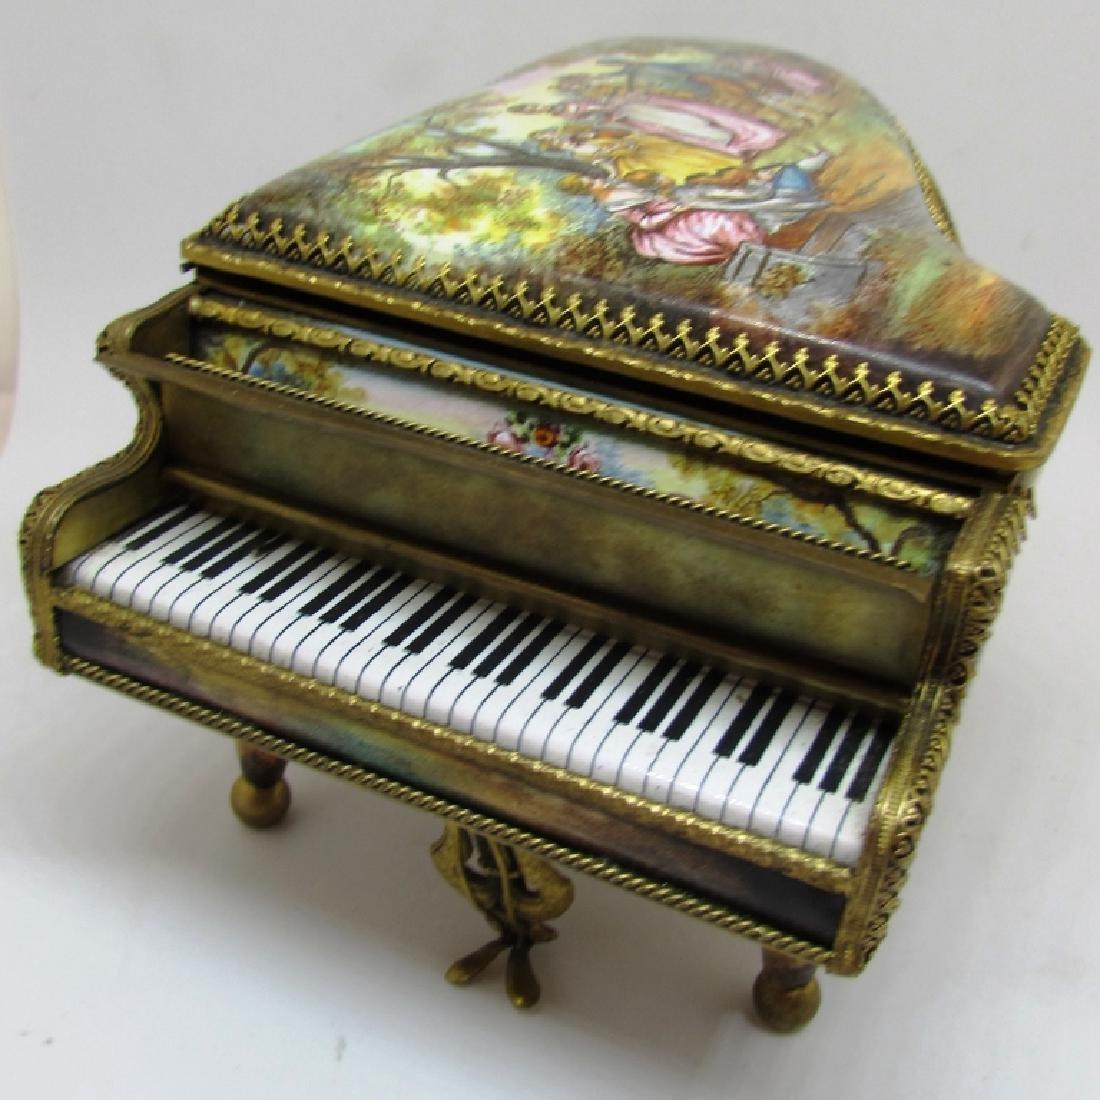 ANTIQUE ENAMEL PAINTED PIANO MUSIC BOX AUSTRIAN